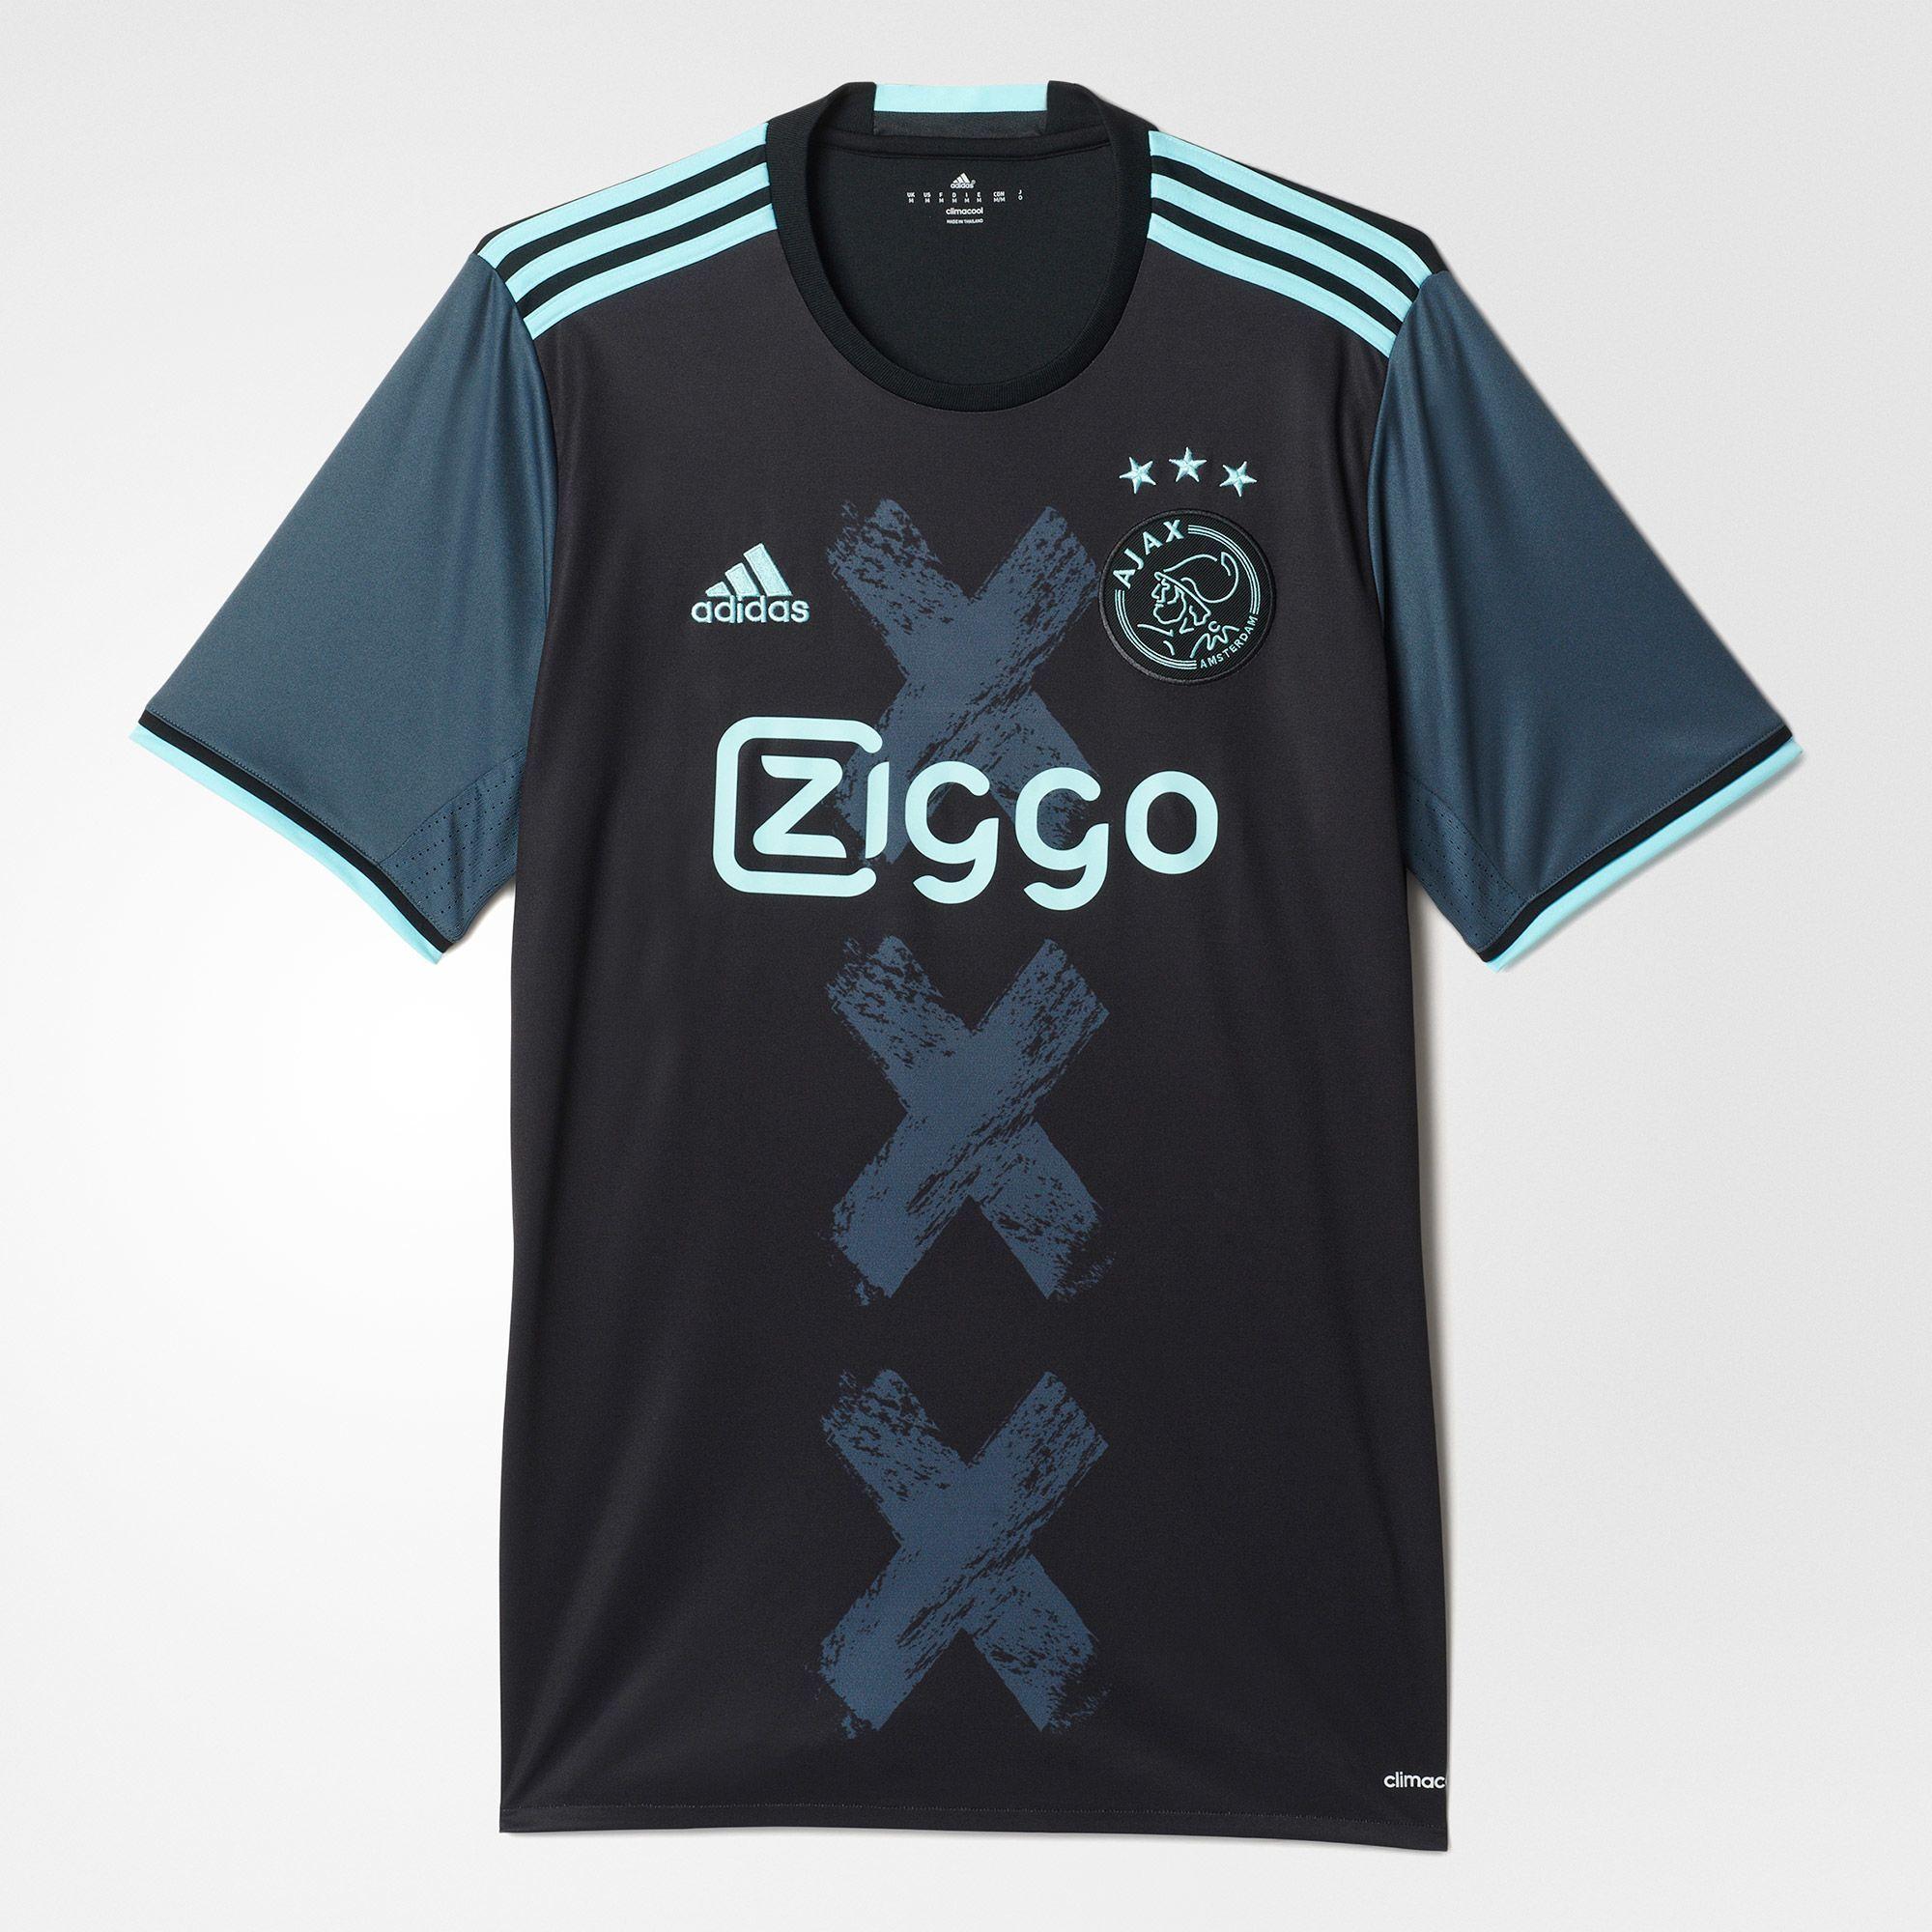 73f5a8499 Ajax 2016 17 Away Jersey